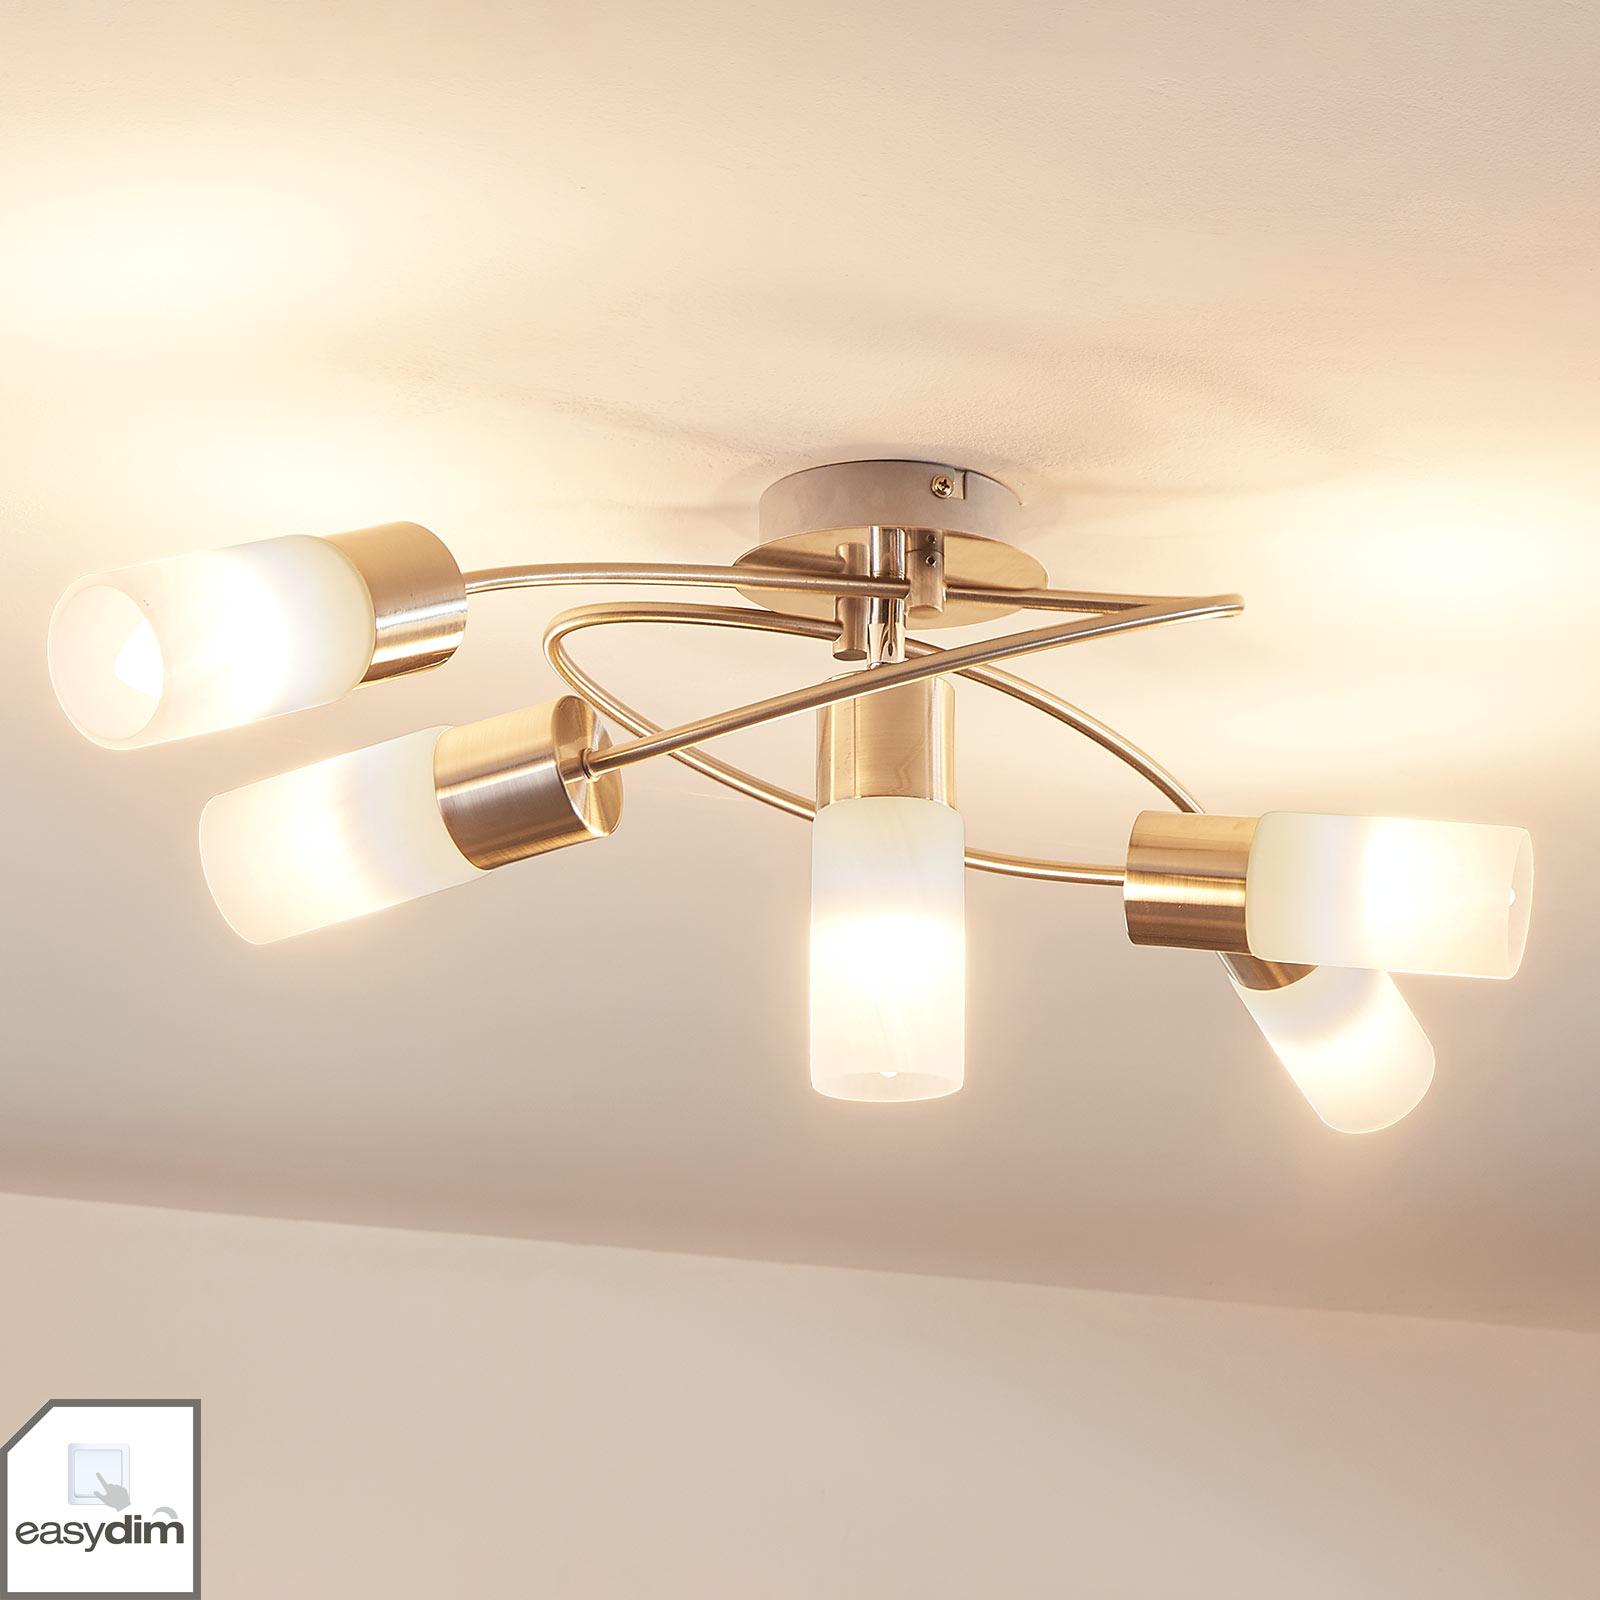 Plafoniera LED Erva dimmerabile, 5 punti luce